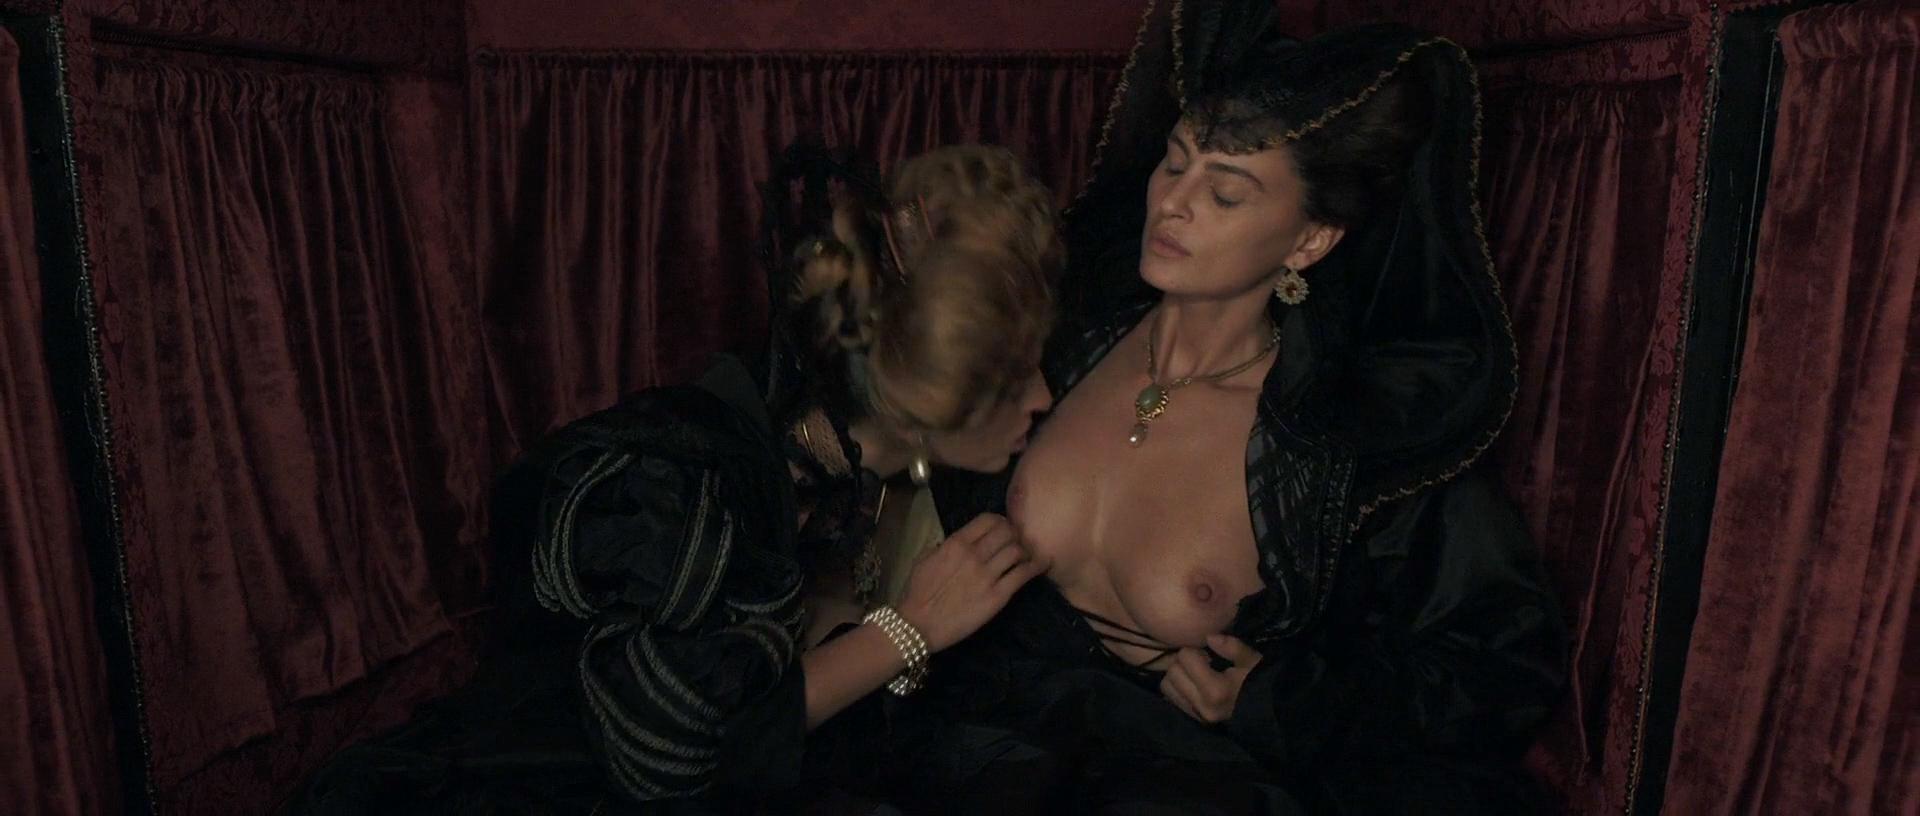 Stacy Martin nude butt others nude - Il racconto dei racconti (2015) hd1080p (11)